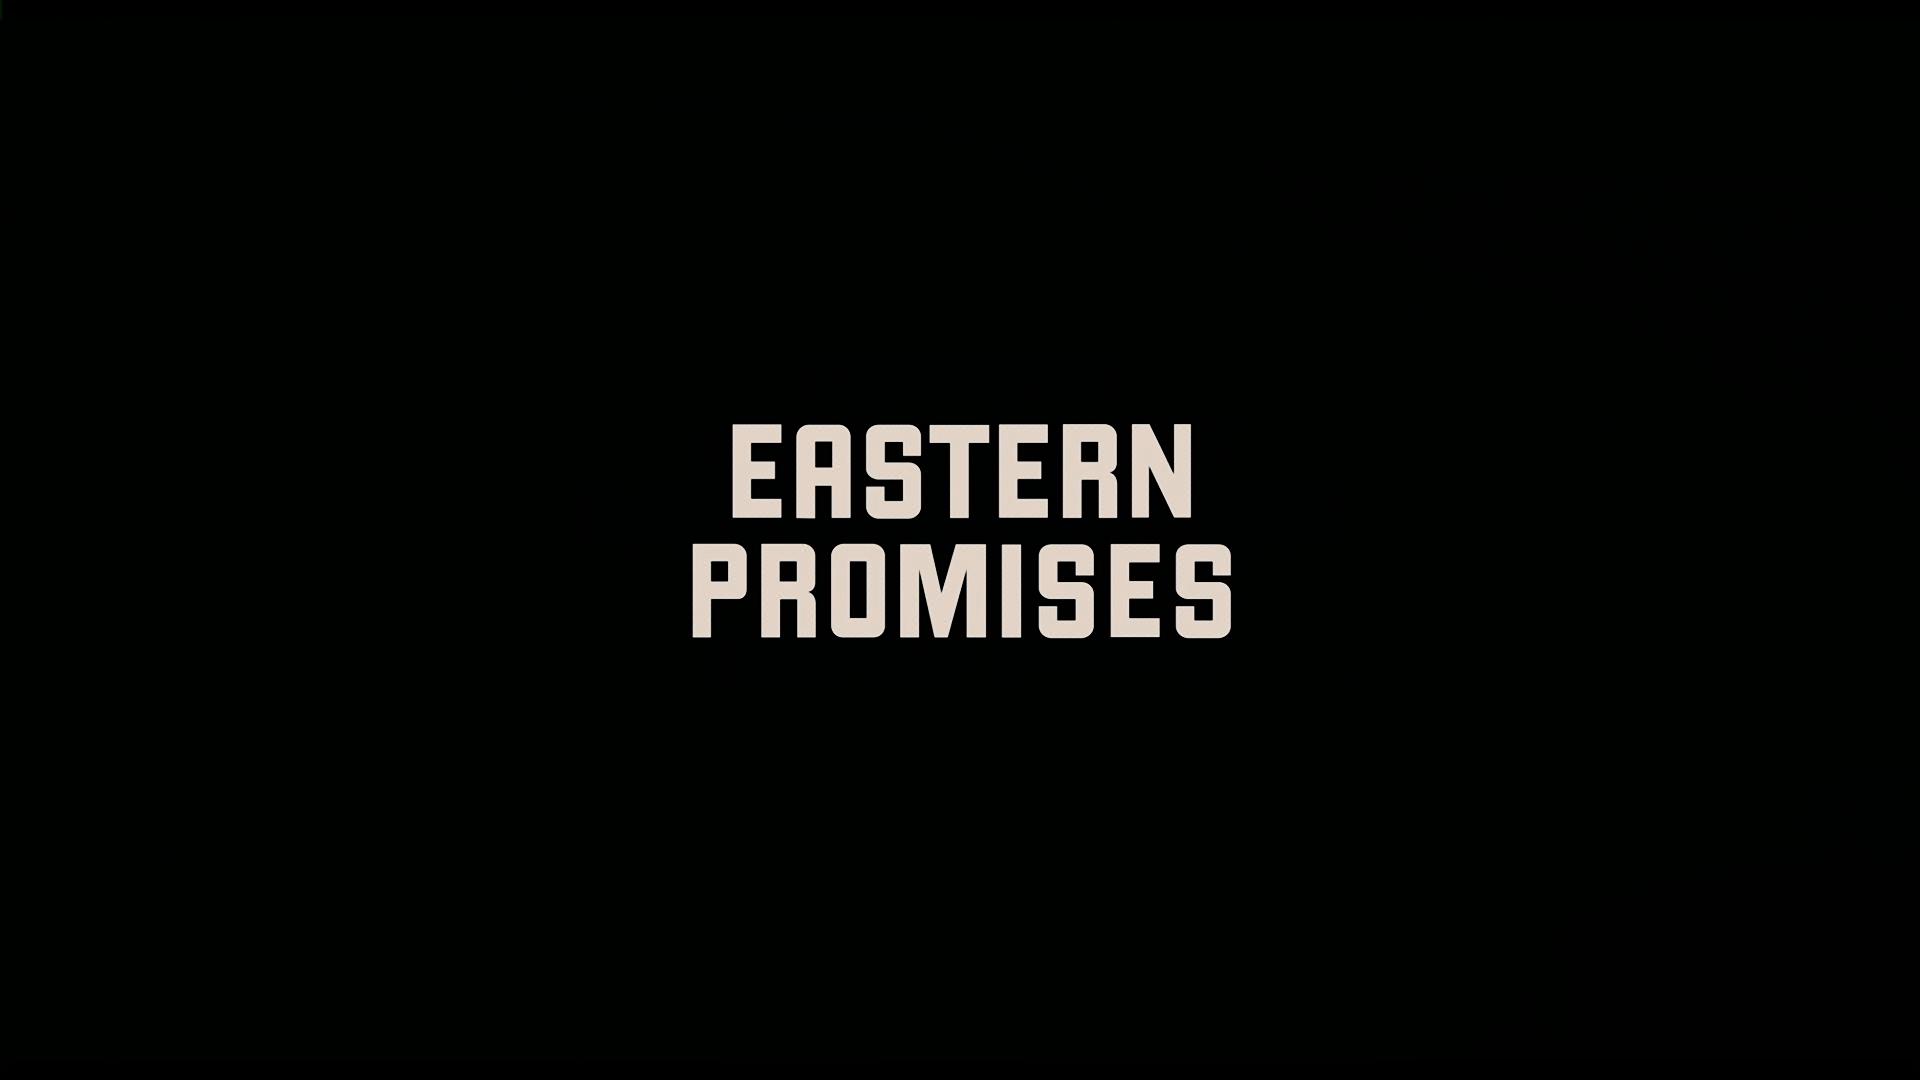 Eastern Promises 2007 Blu Screens